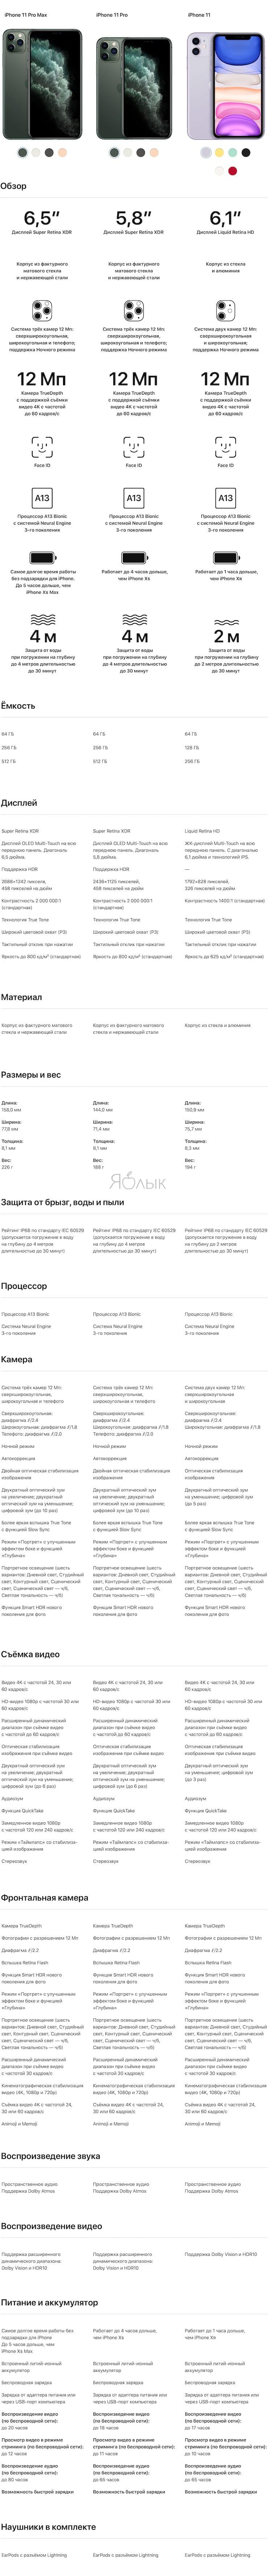 Сравнение технических характеристик (спецификаций) iPhone 11 и iPhone 11 Pro /iPhone 11 Pro Max